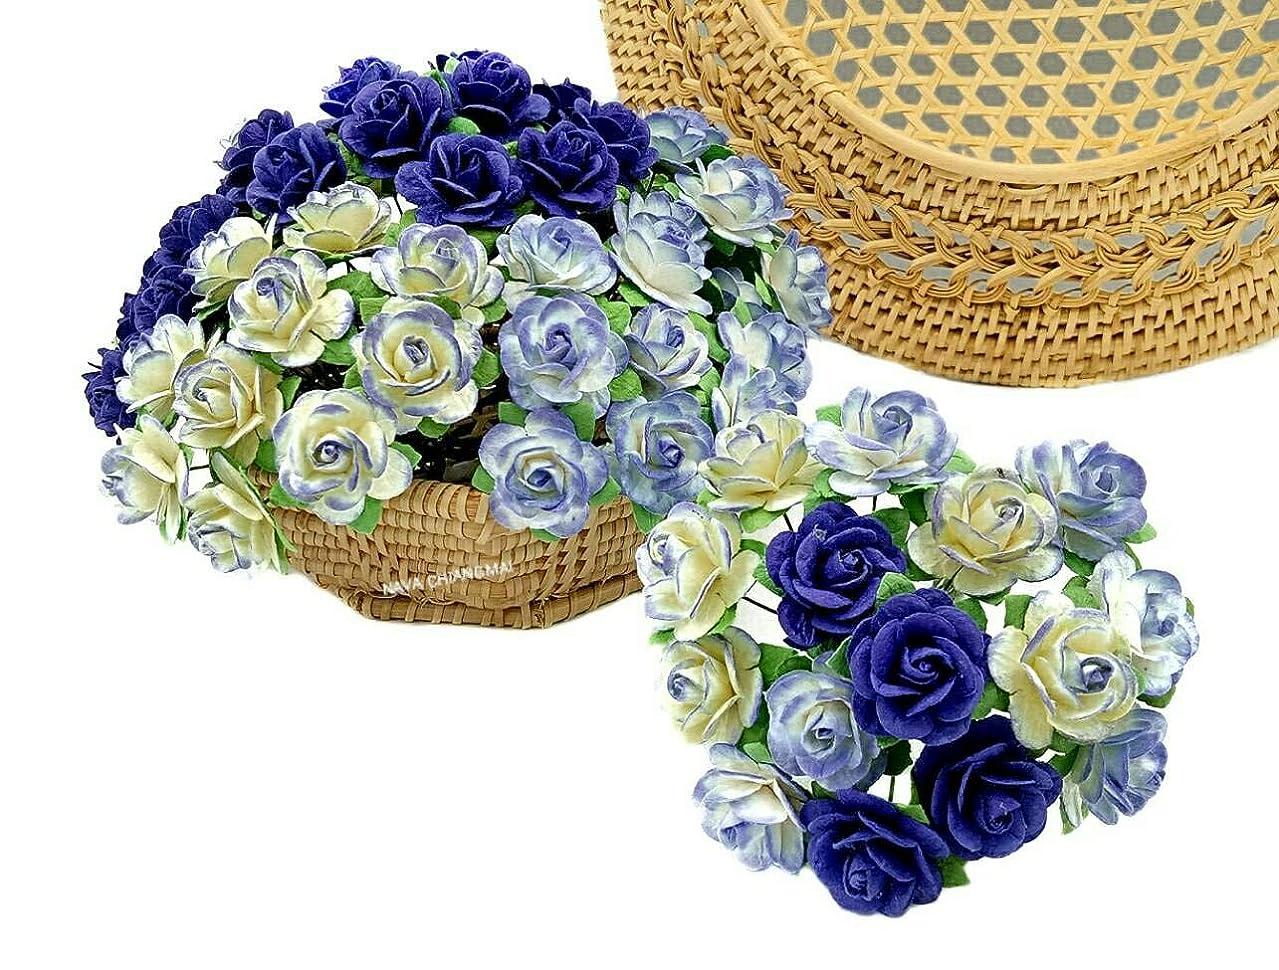 NAVA CHIANGMAI 60 pcs Rose 20mm Purple Mulberry Paper Flowers handmade craft project cardmaking Floral Valentine